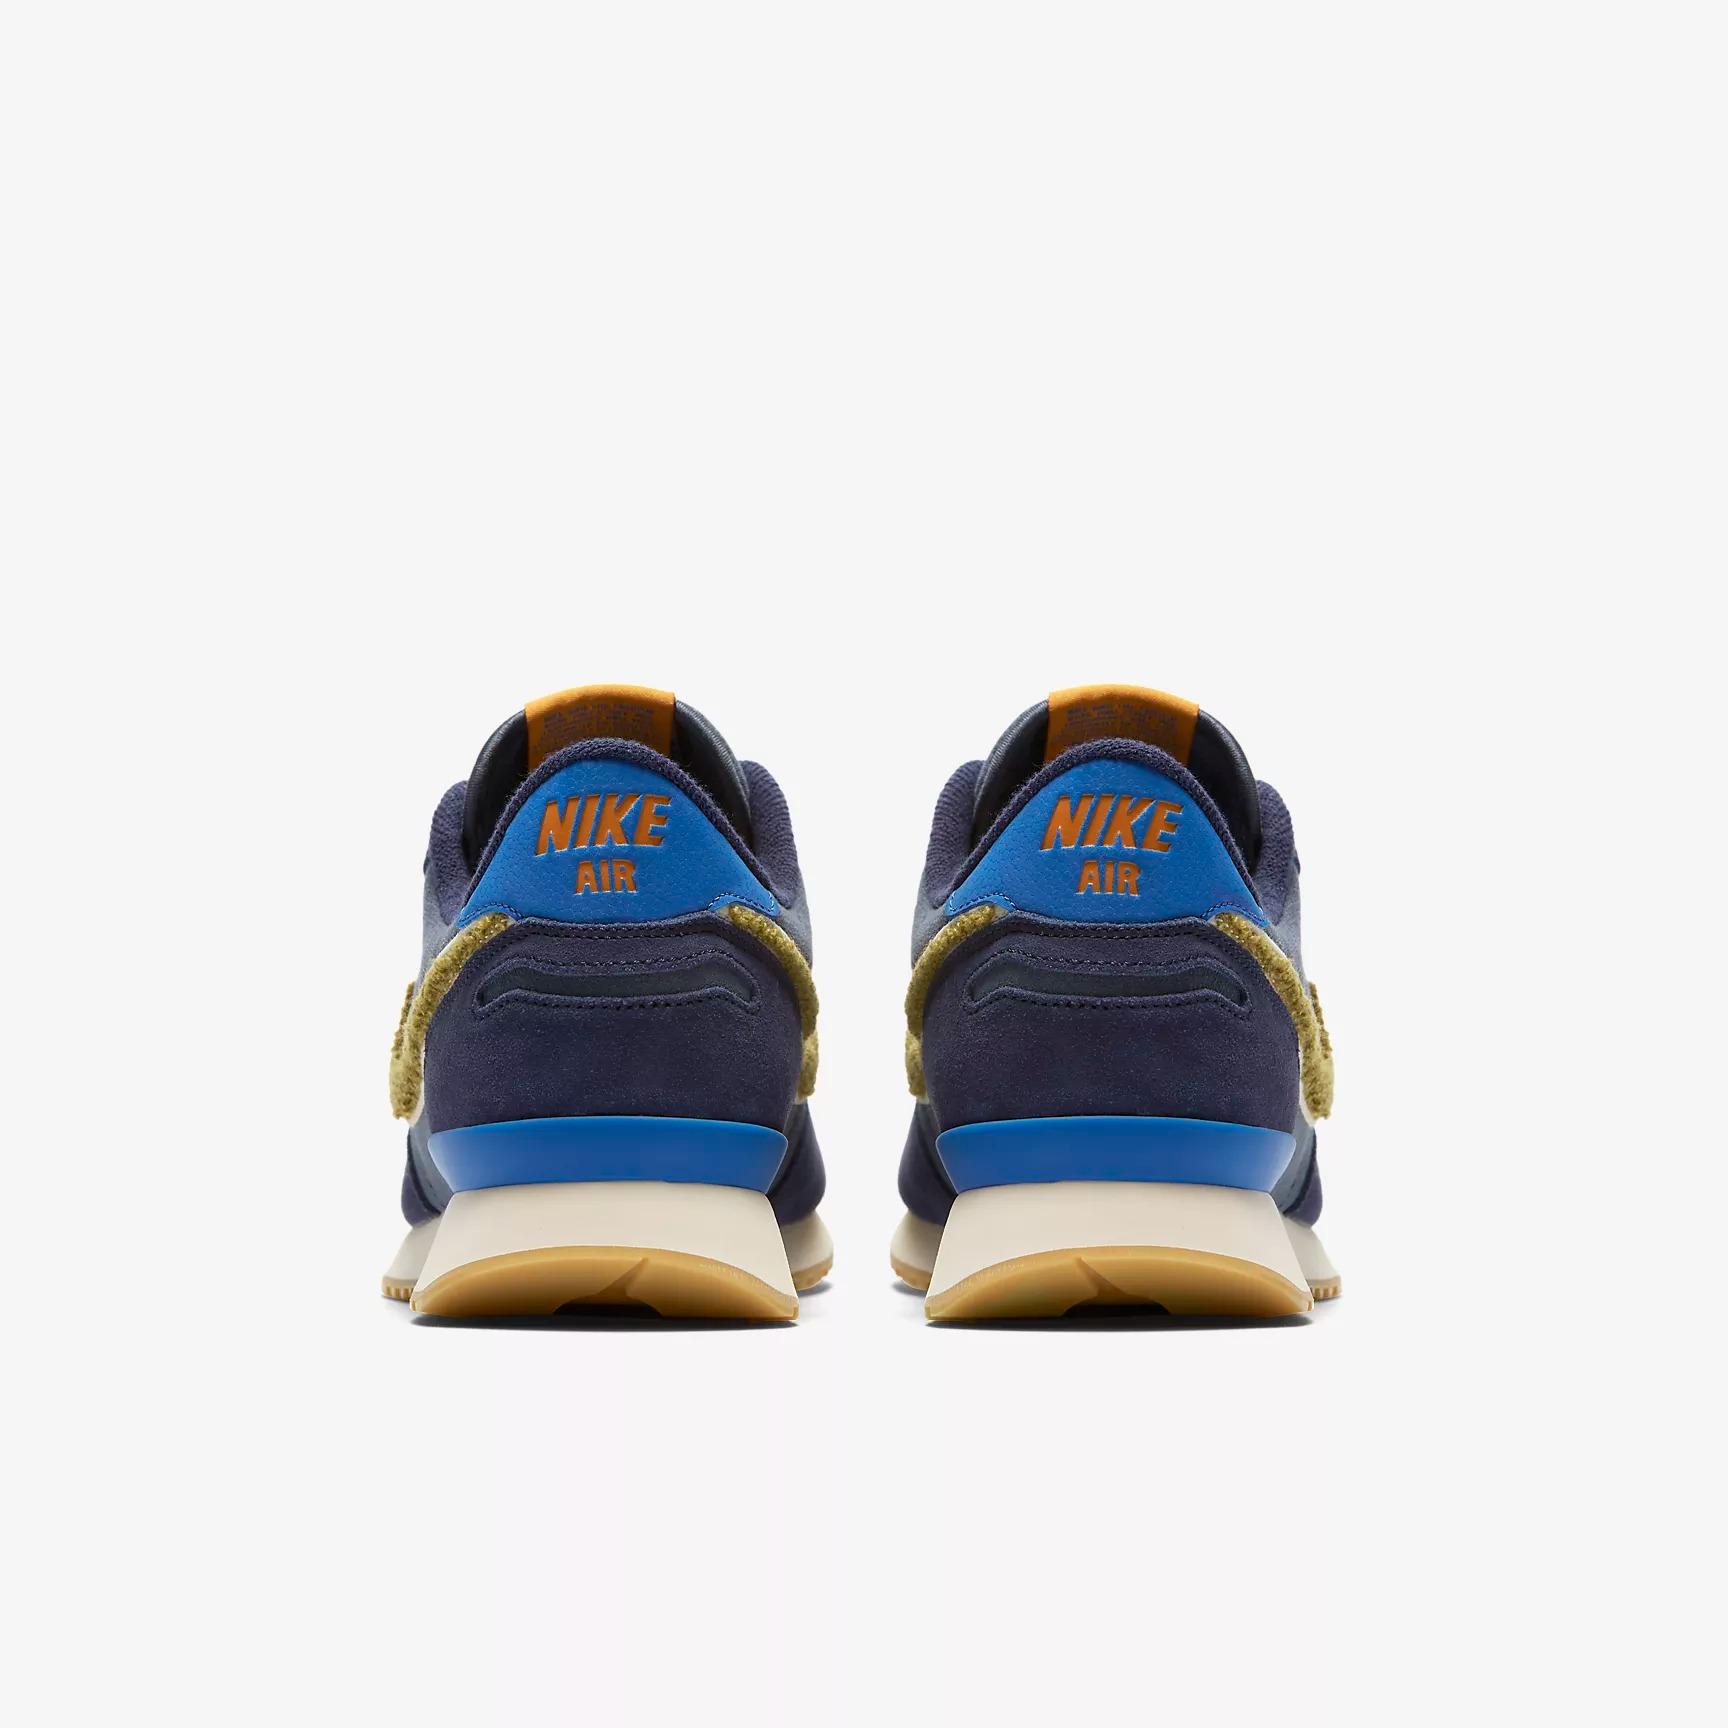 promo code 24359 81375 Nike Air Vortex SE Sneakers